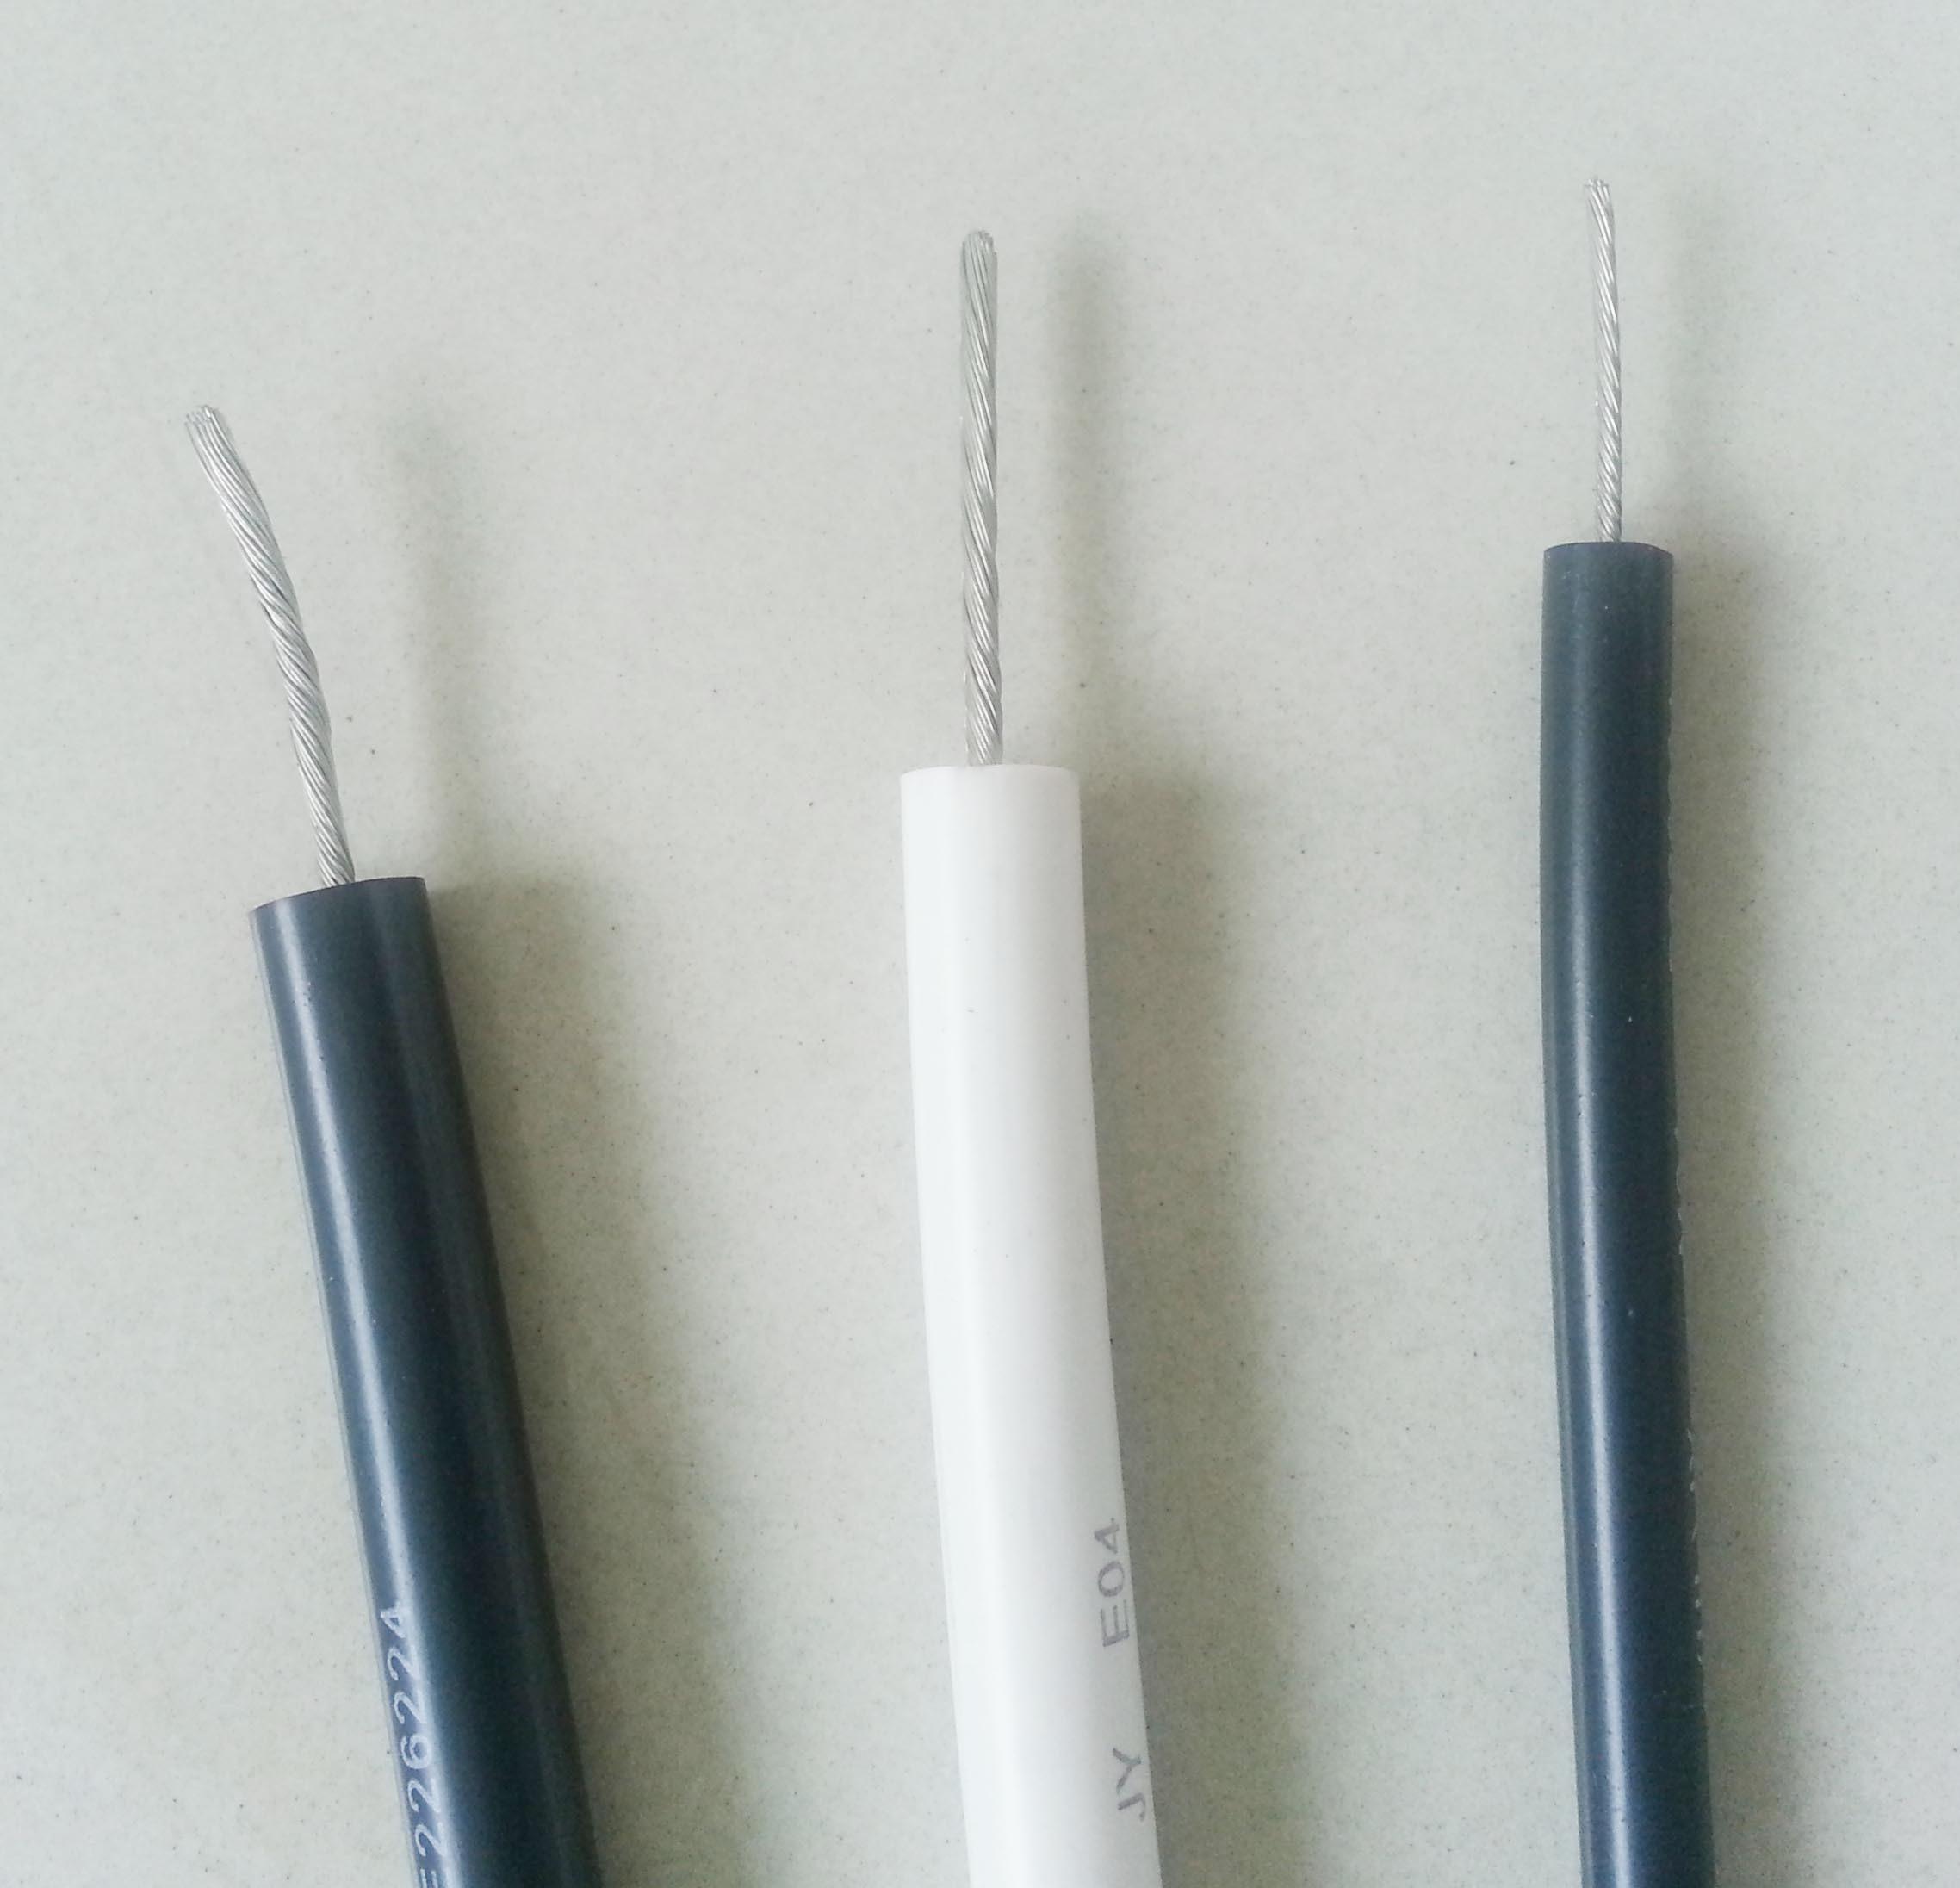 Silicone Rubber Insulation Wires